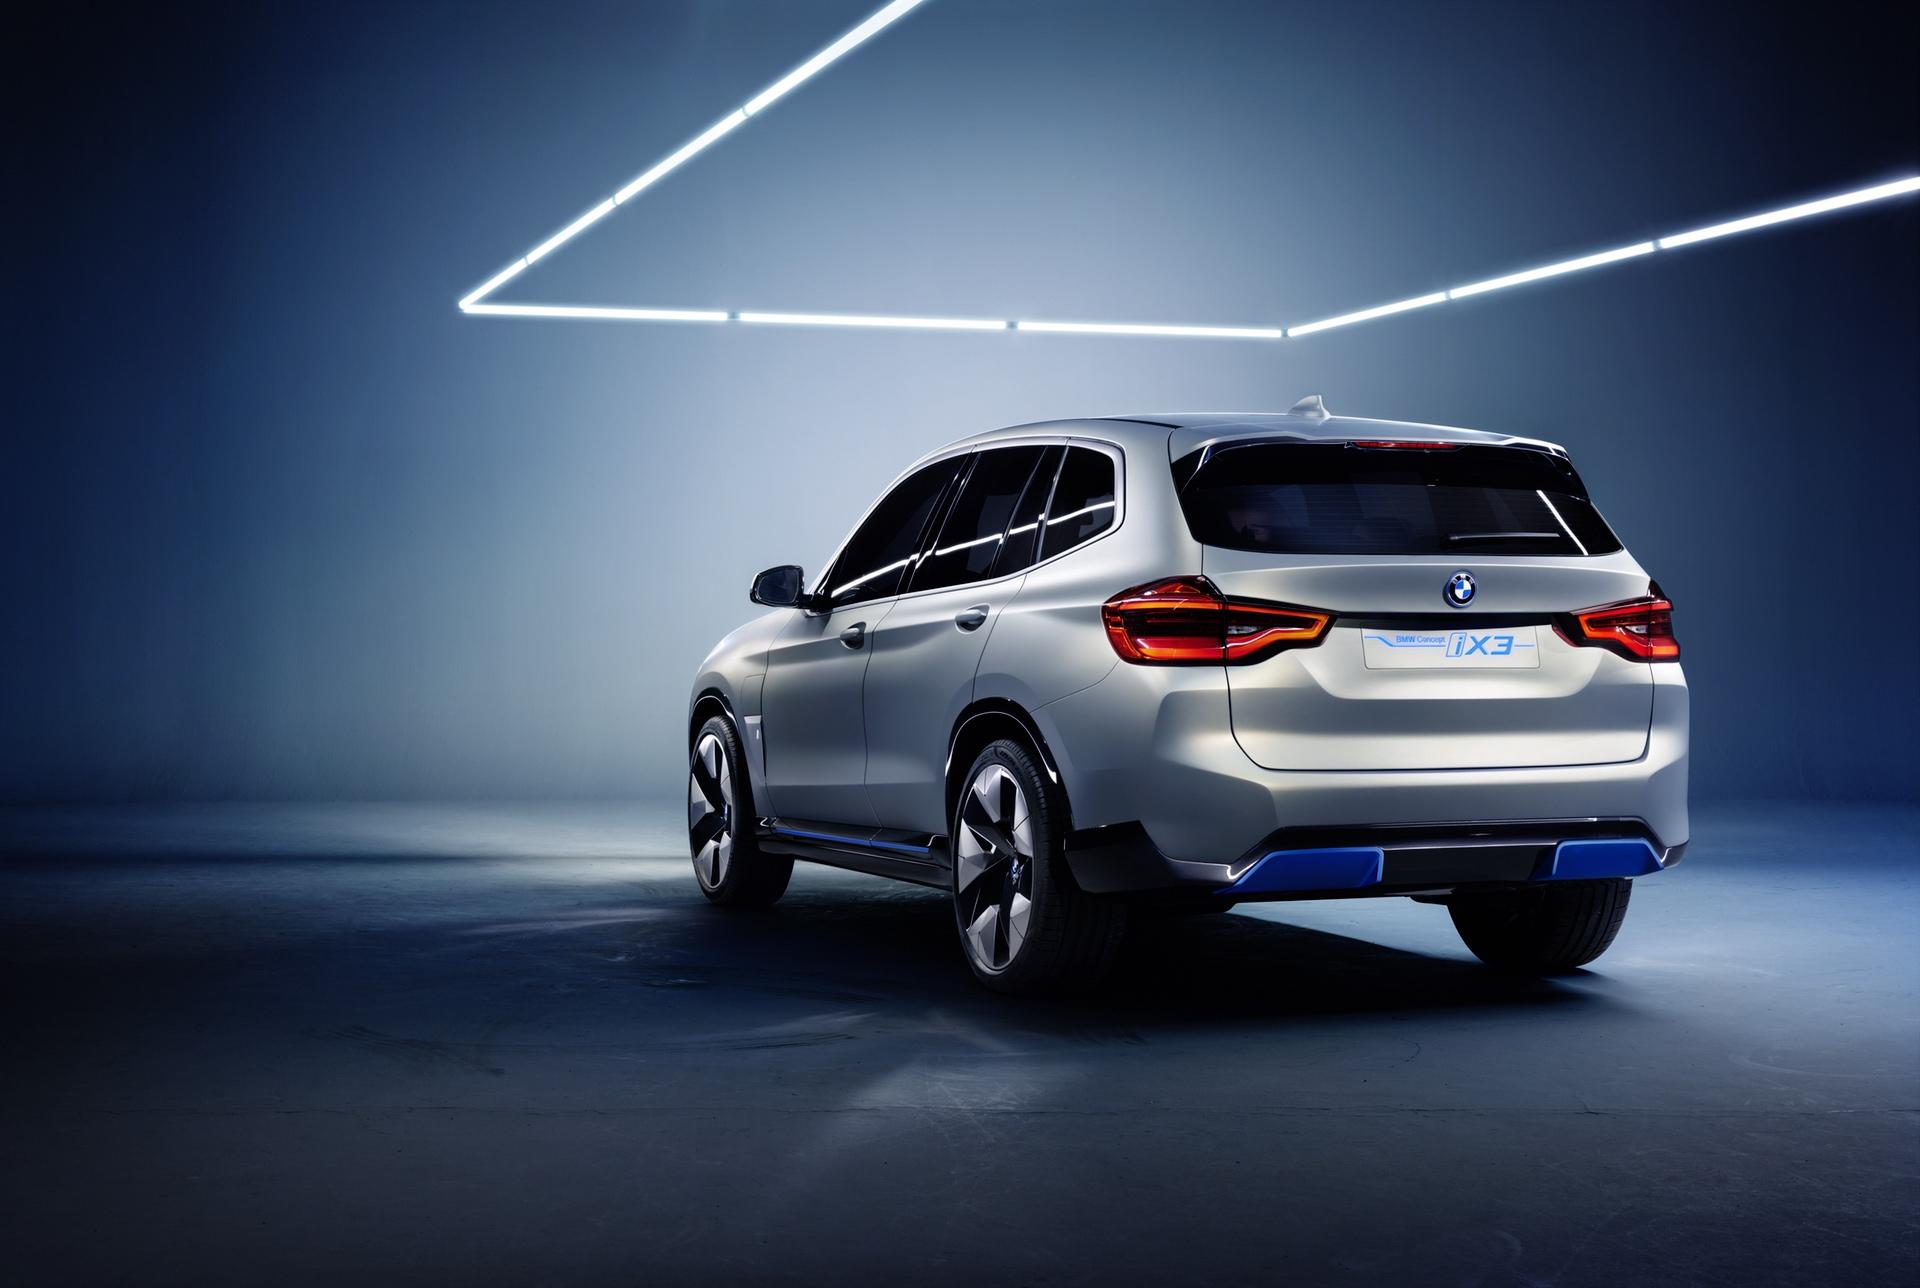 BMW_iX3_Concept_0003